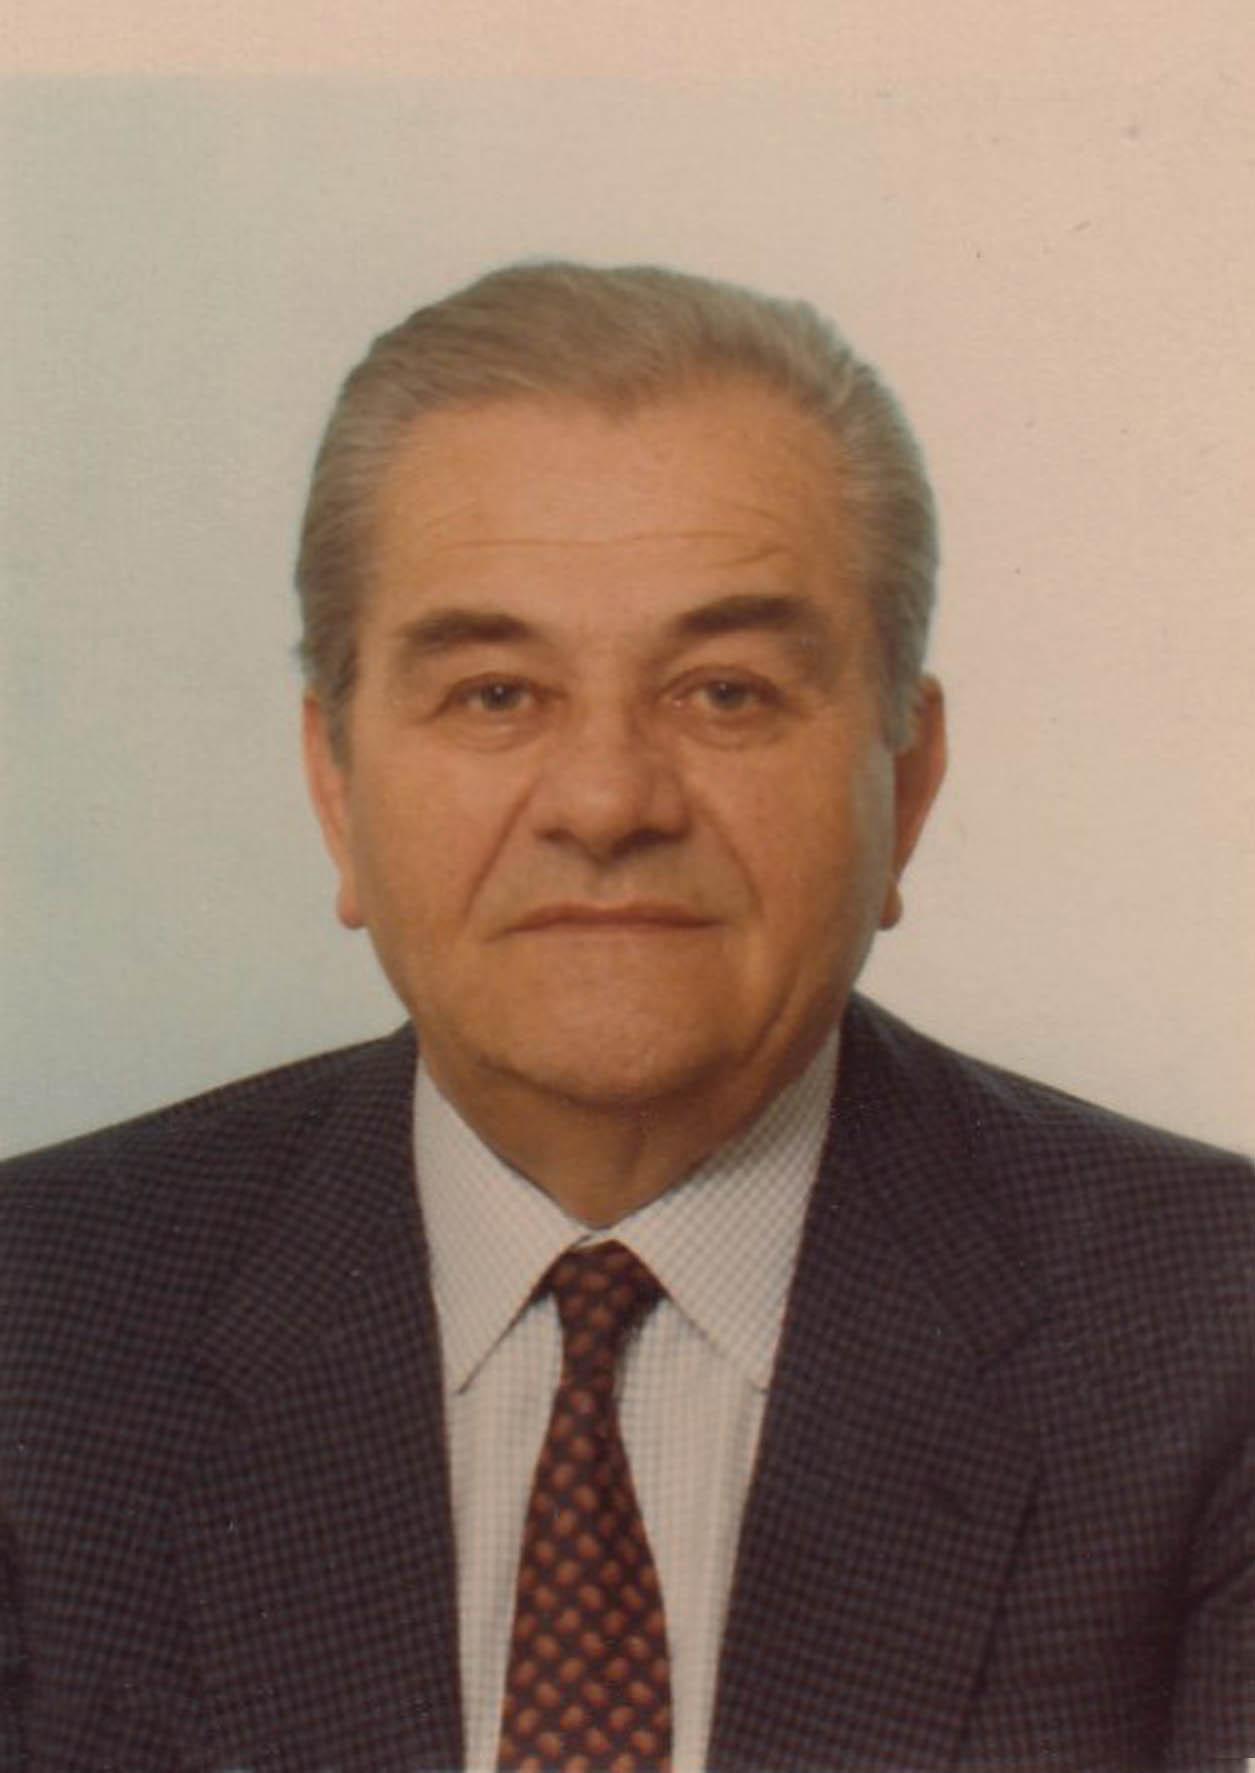 Necrologi Caselle Torinese - LUIGI OSSOLA